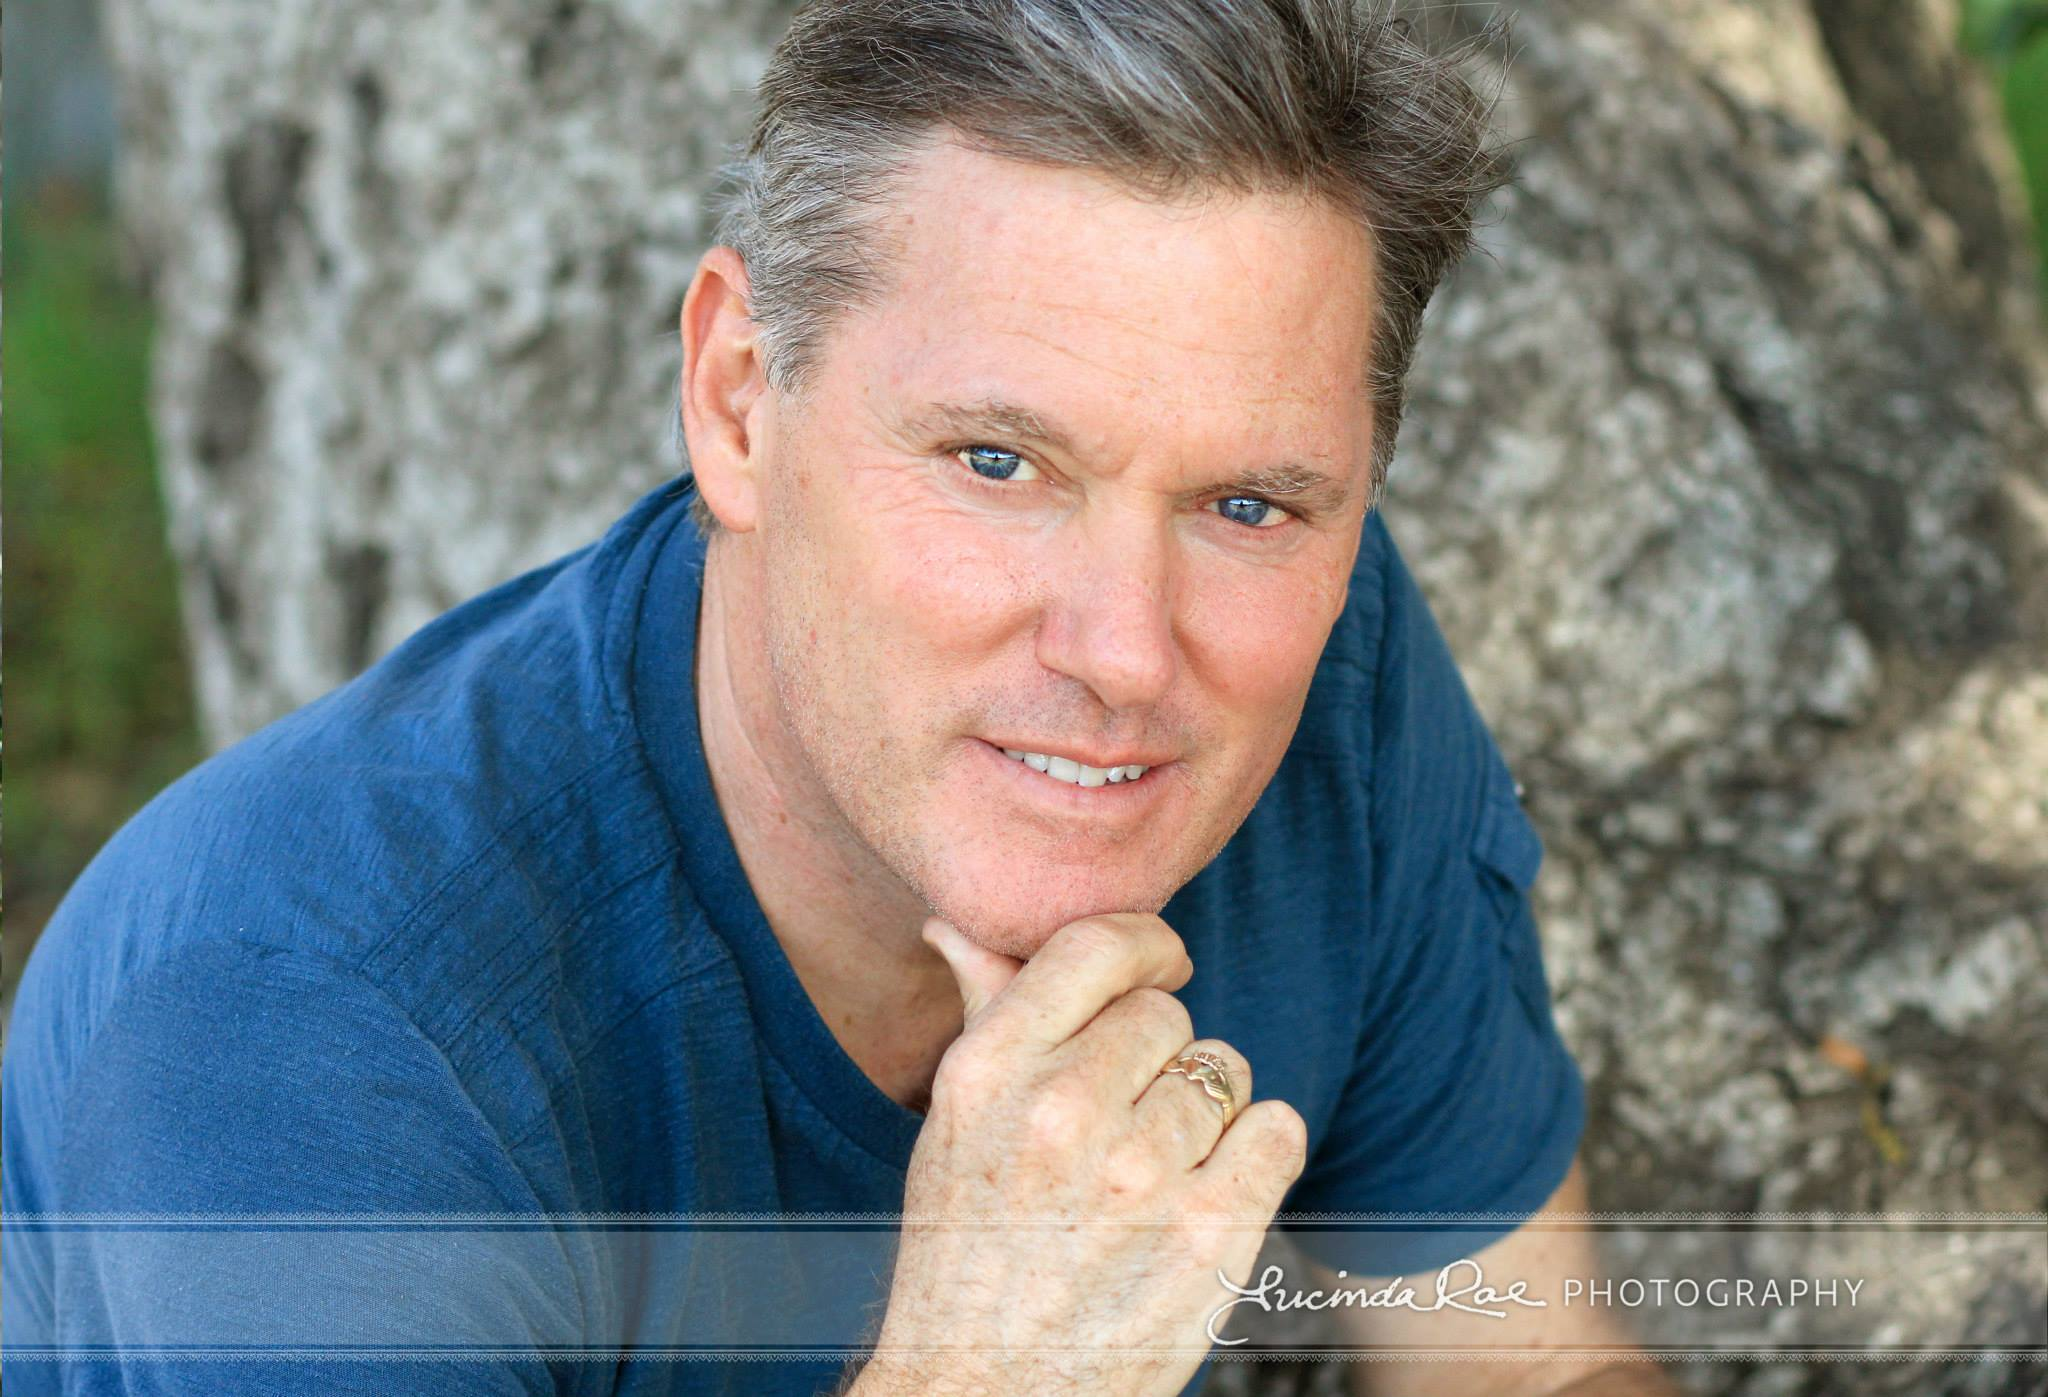 Peter Christian Donovan | Lucinda Rae Photography